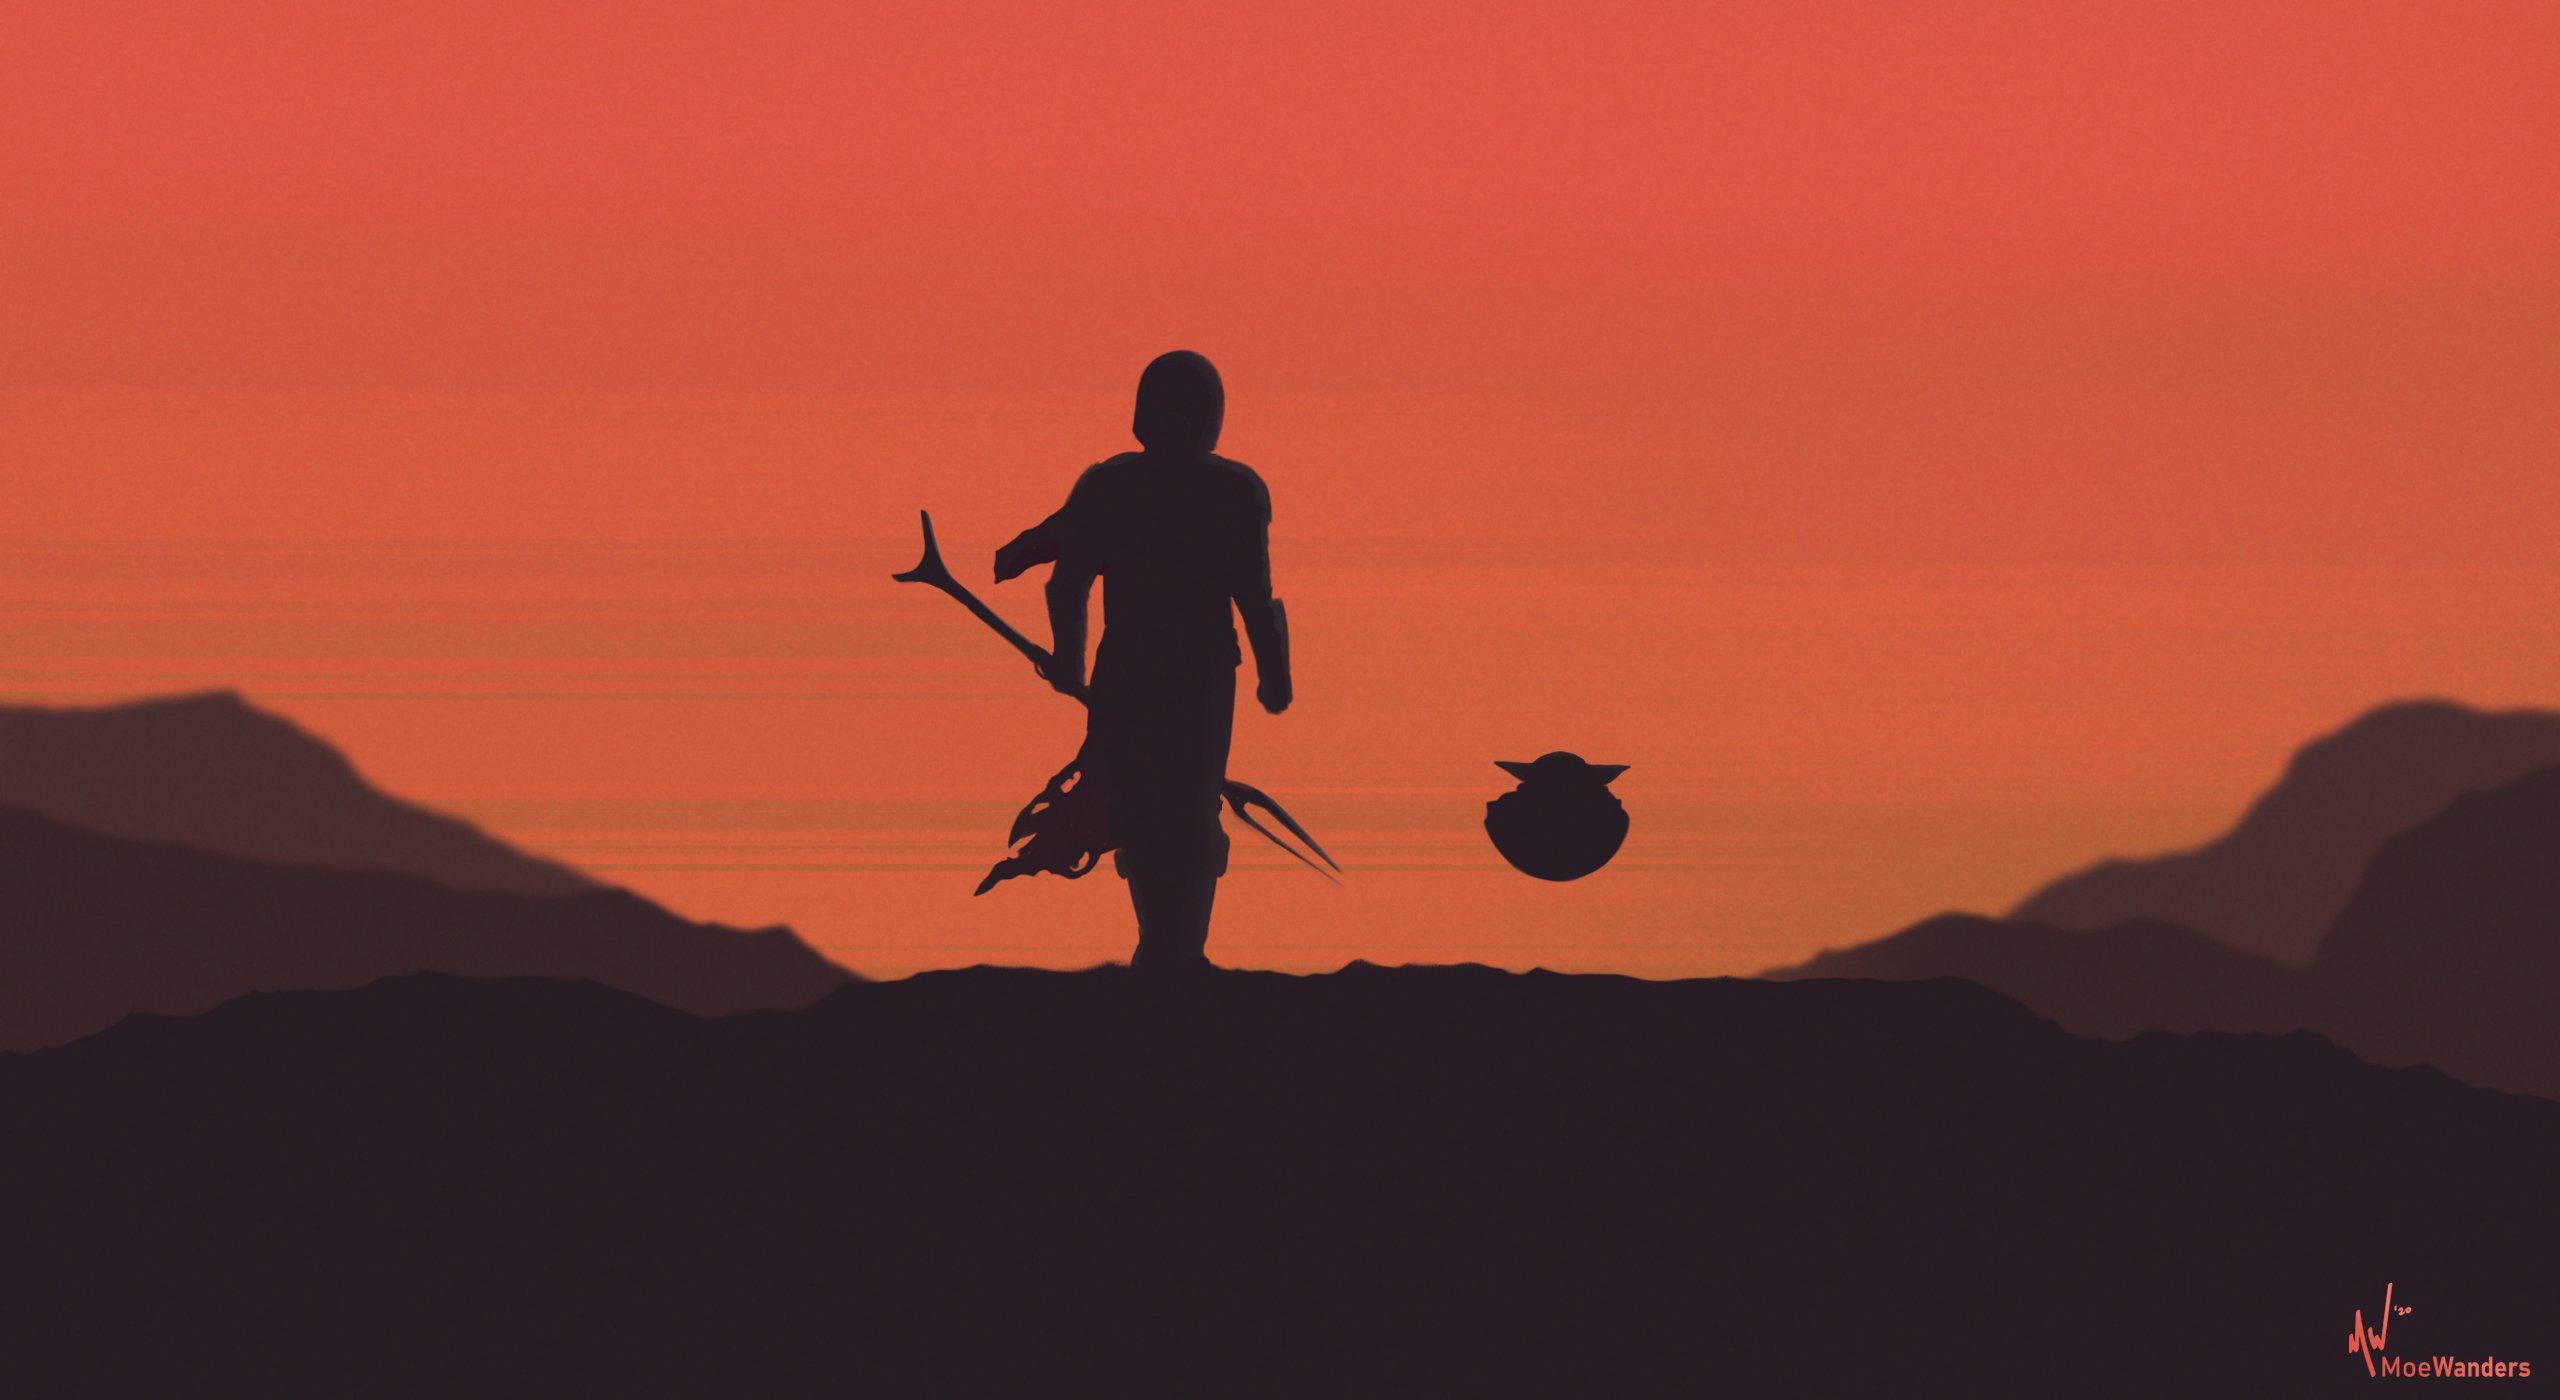 General 2560x1400 digital art The Mandalorian science fiction series Momo (artist)